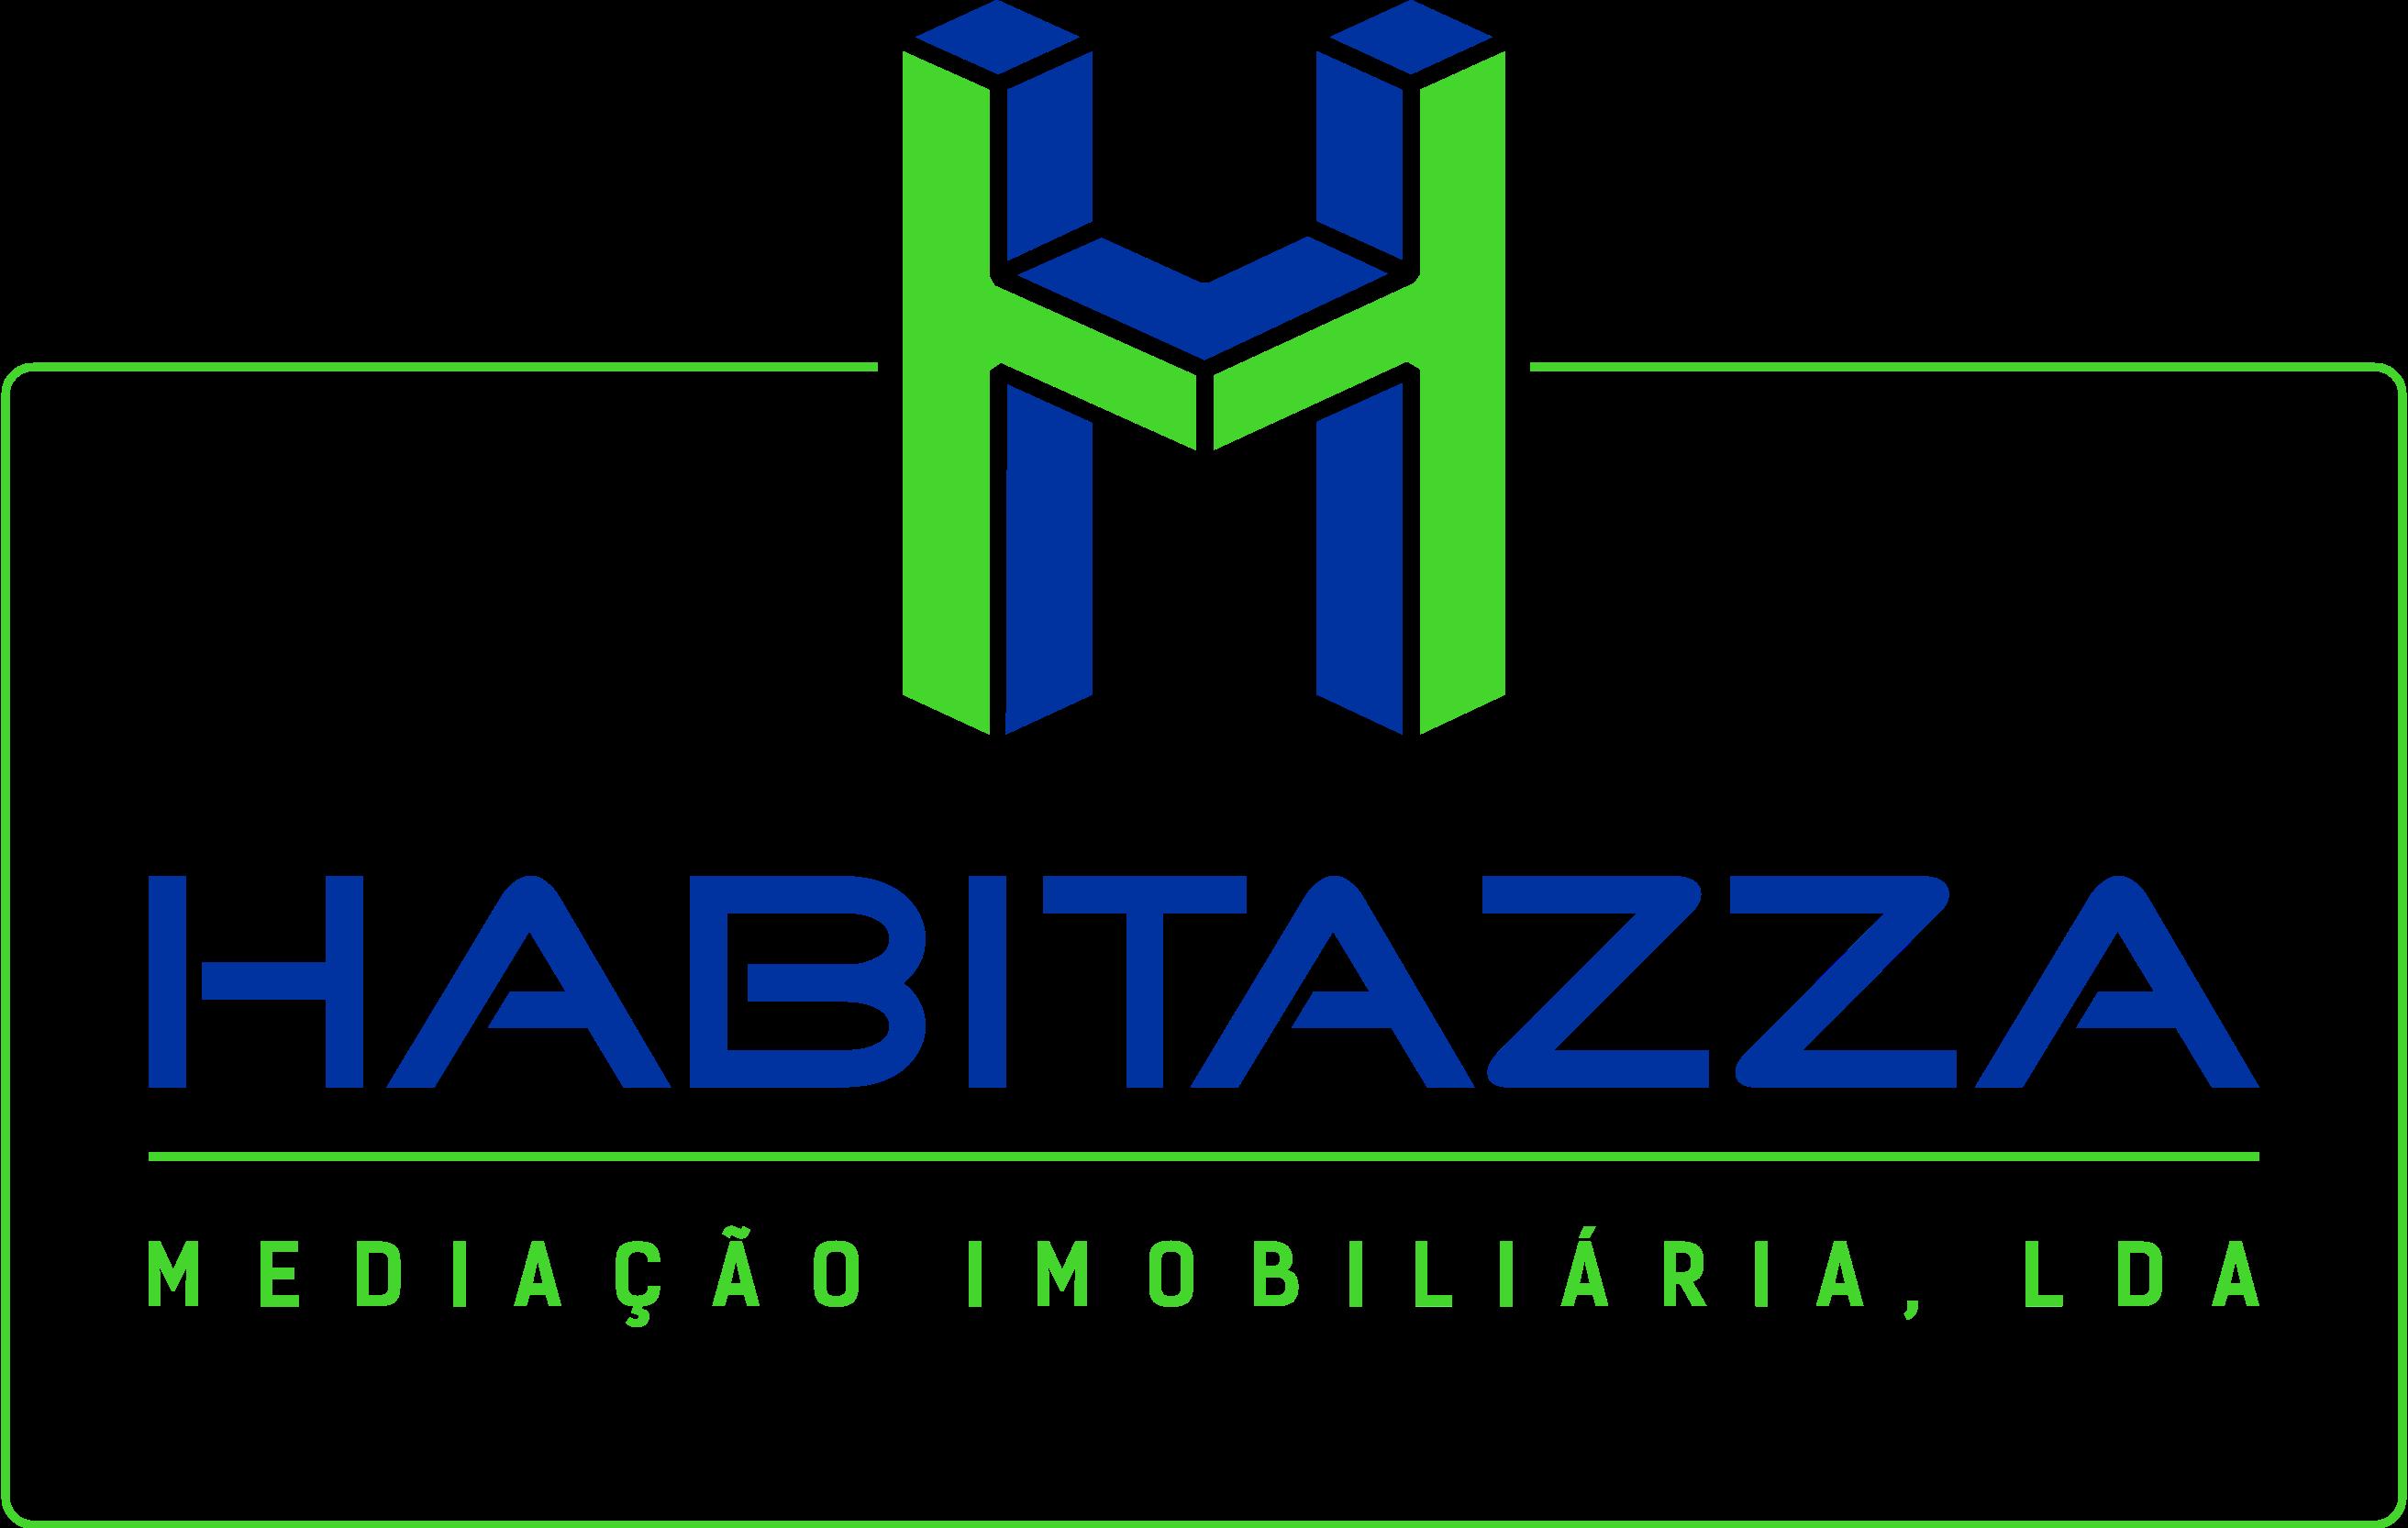 HABITAZZA